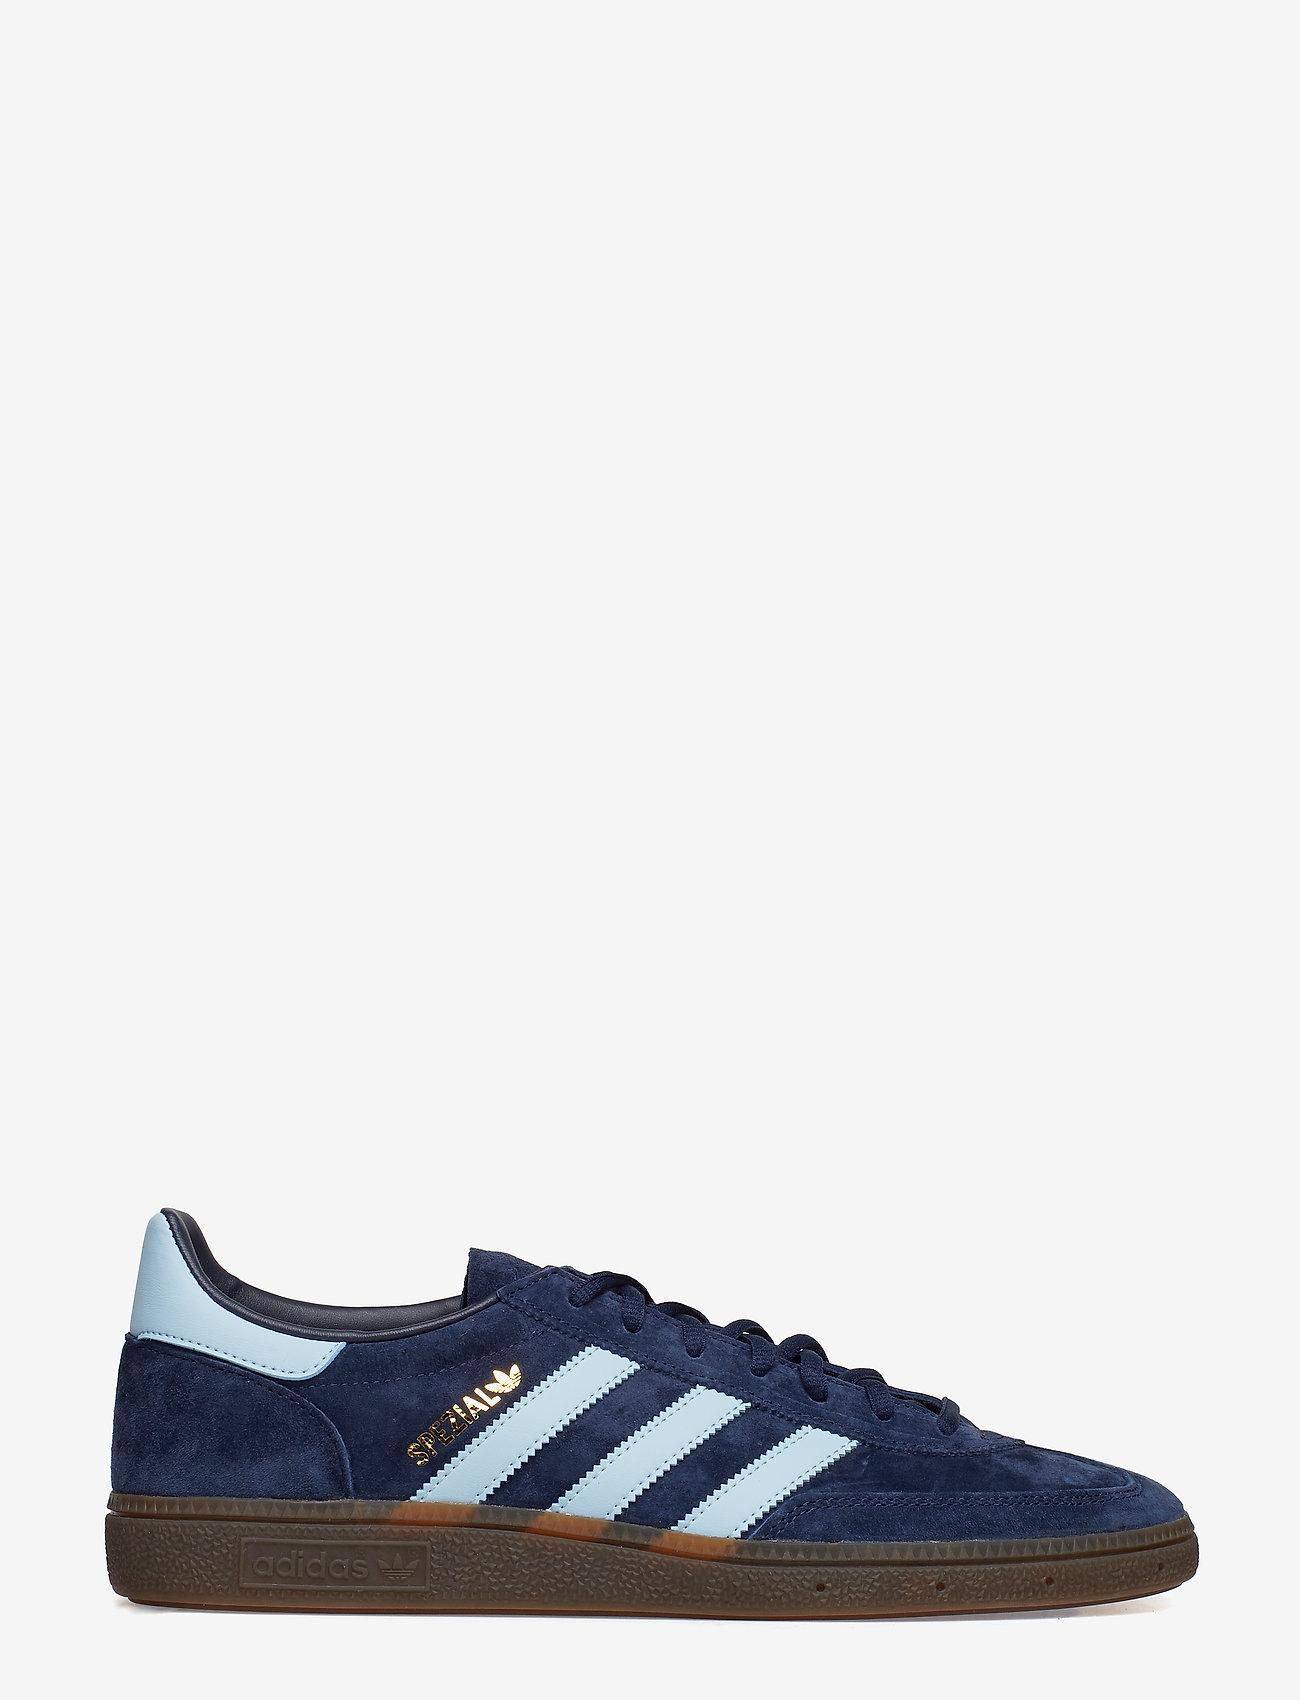 adidas Originals - Handball Spezial - lav ankel - conavy/clesky/gum5 - 1